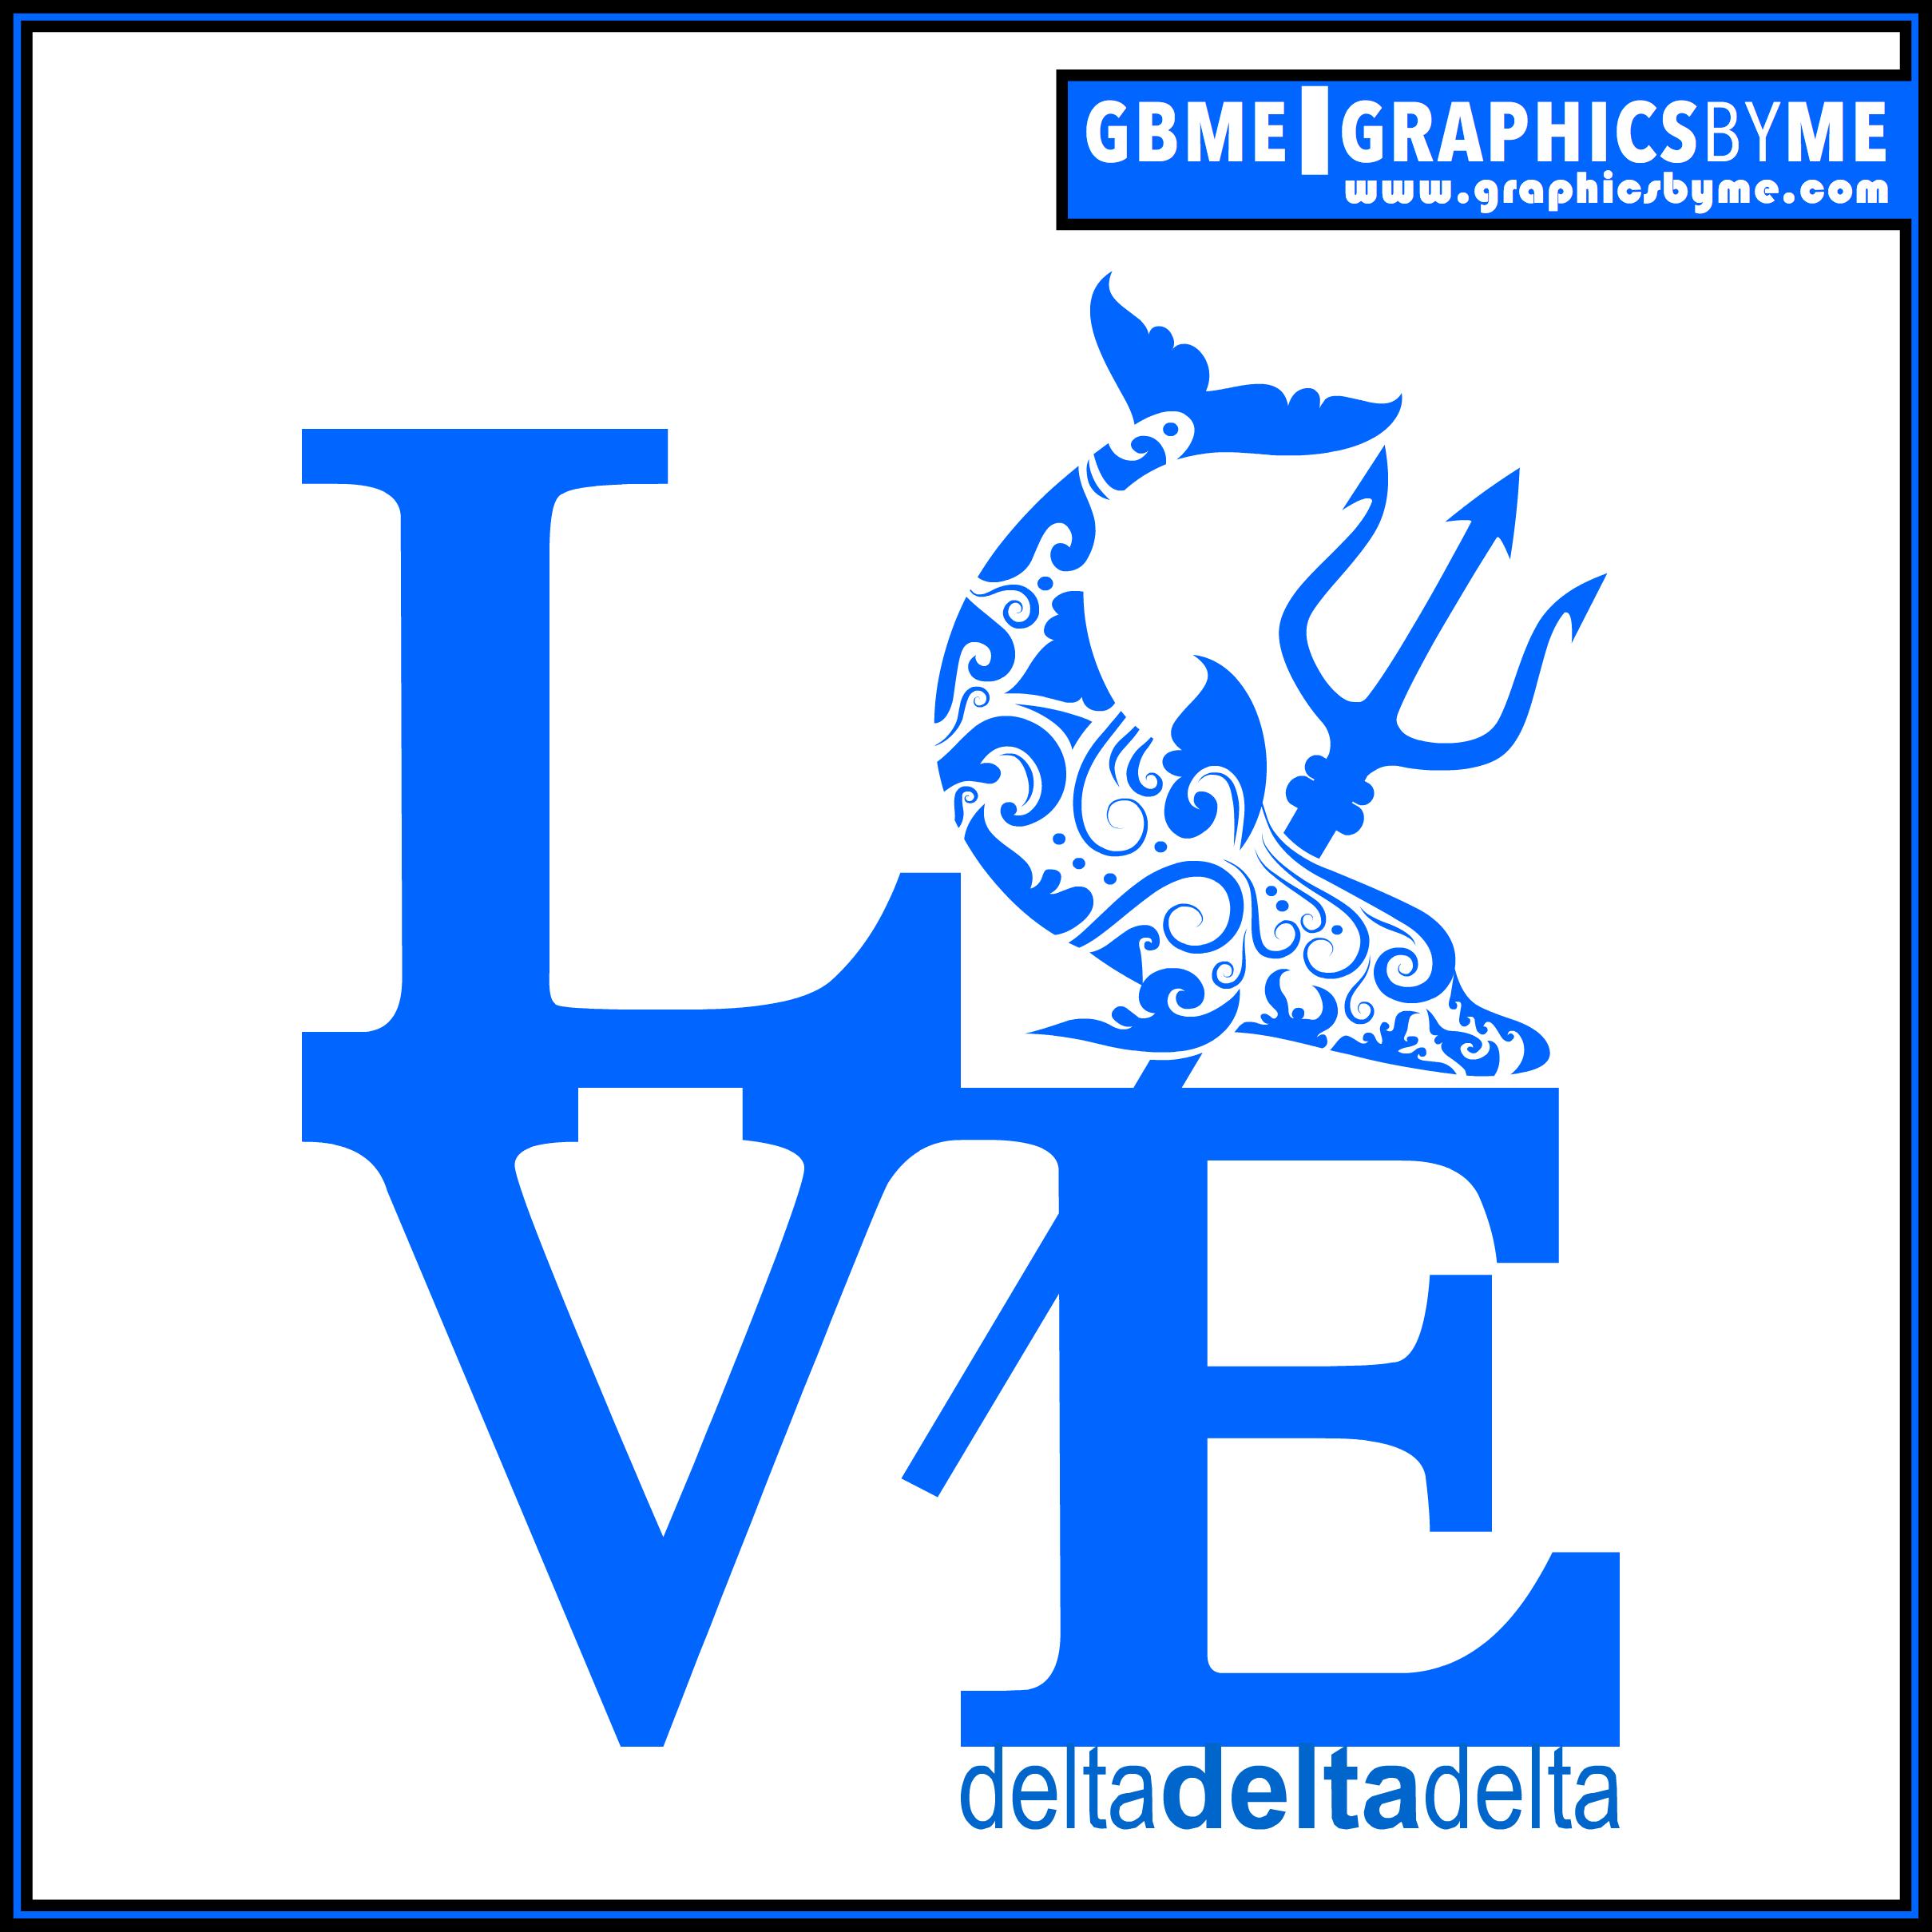 Delta love symbol design for individual purchase at the gbme delta love symbol design for individual purchase at the gbme store deltadeltadelta buycottarizona